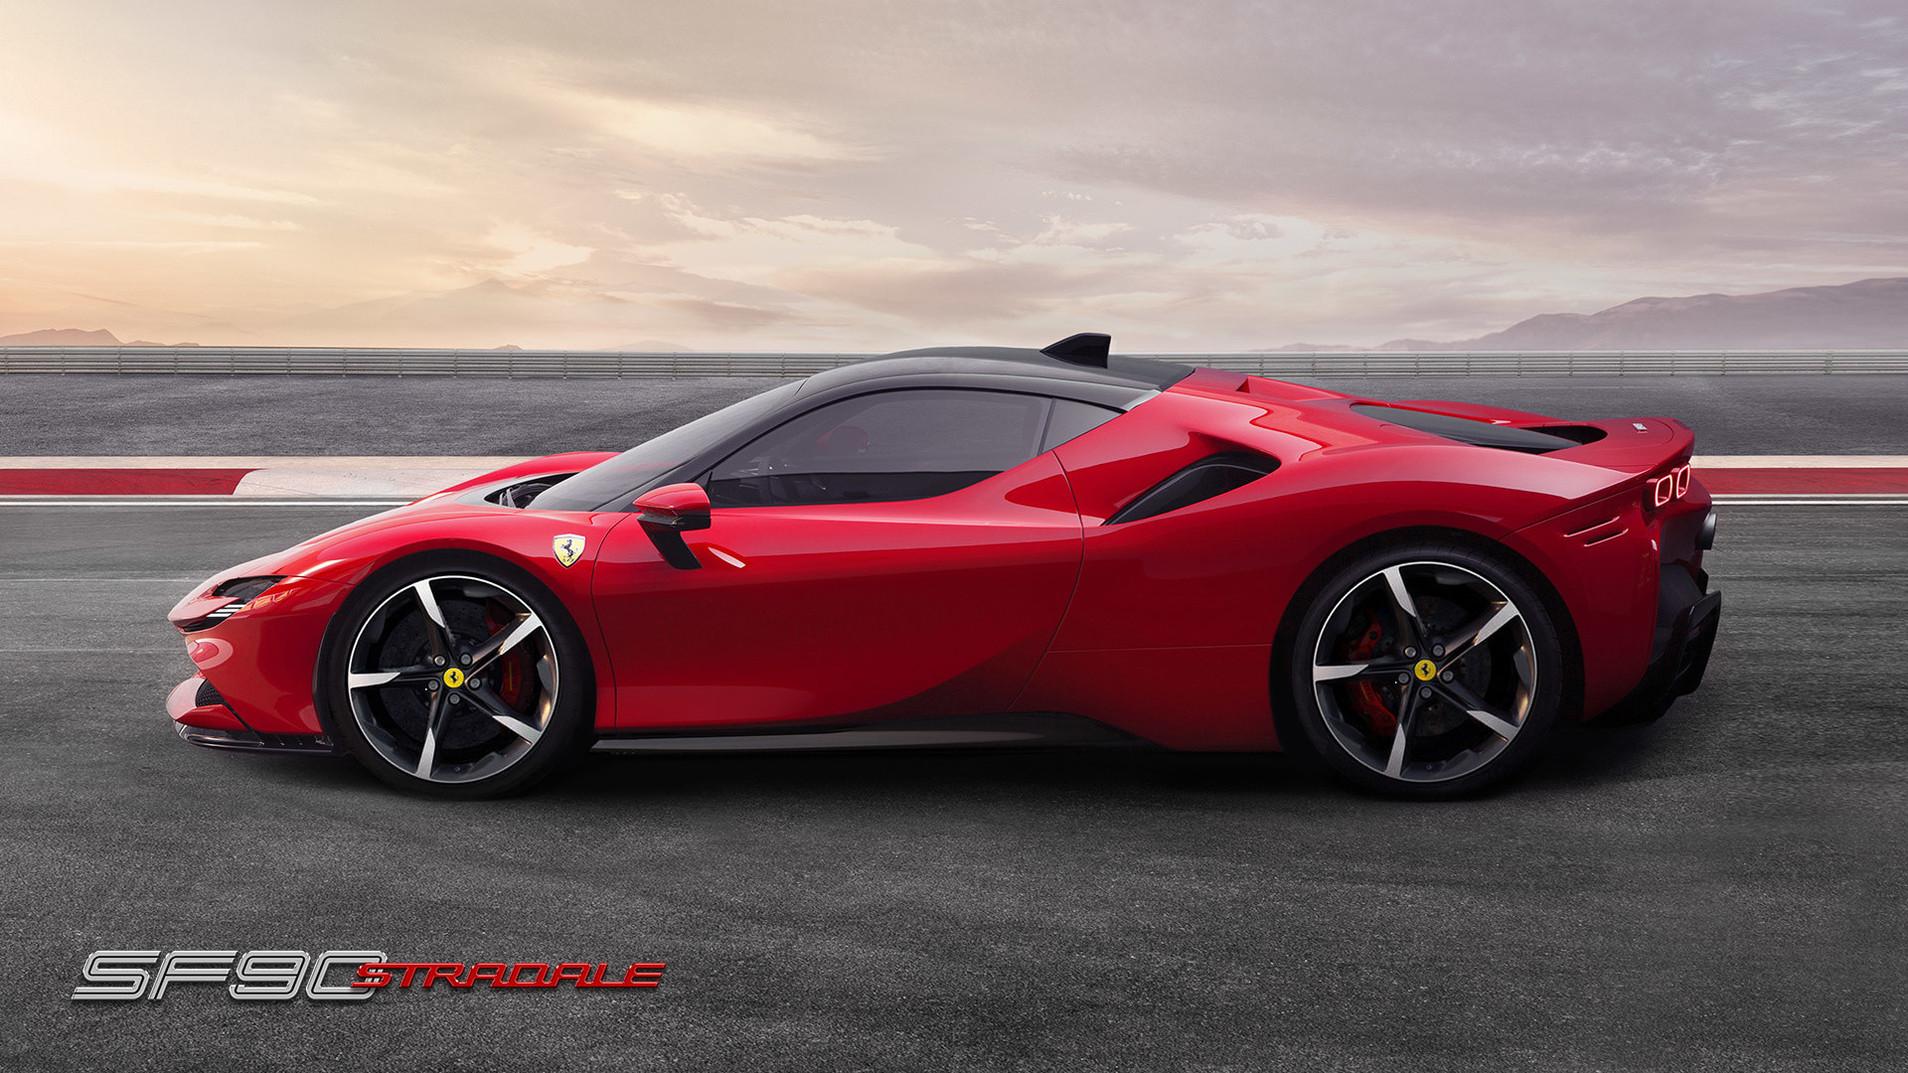 0x0-Ferrari_SF90_Stradale_3.jpg